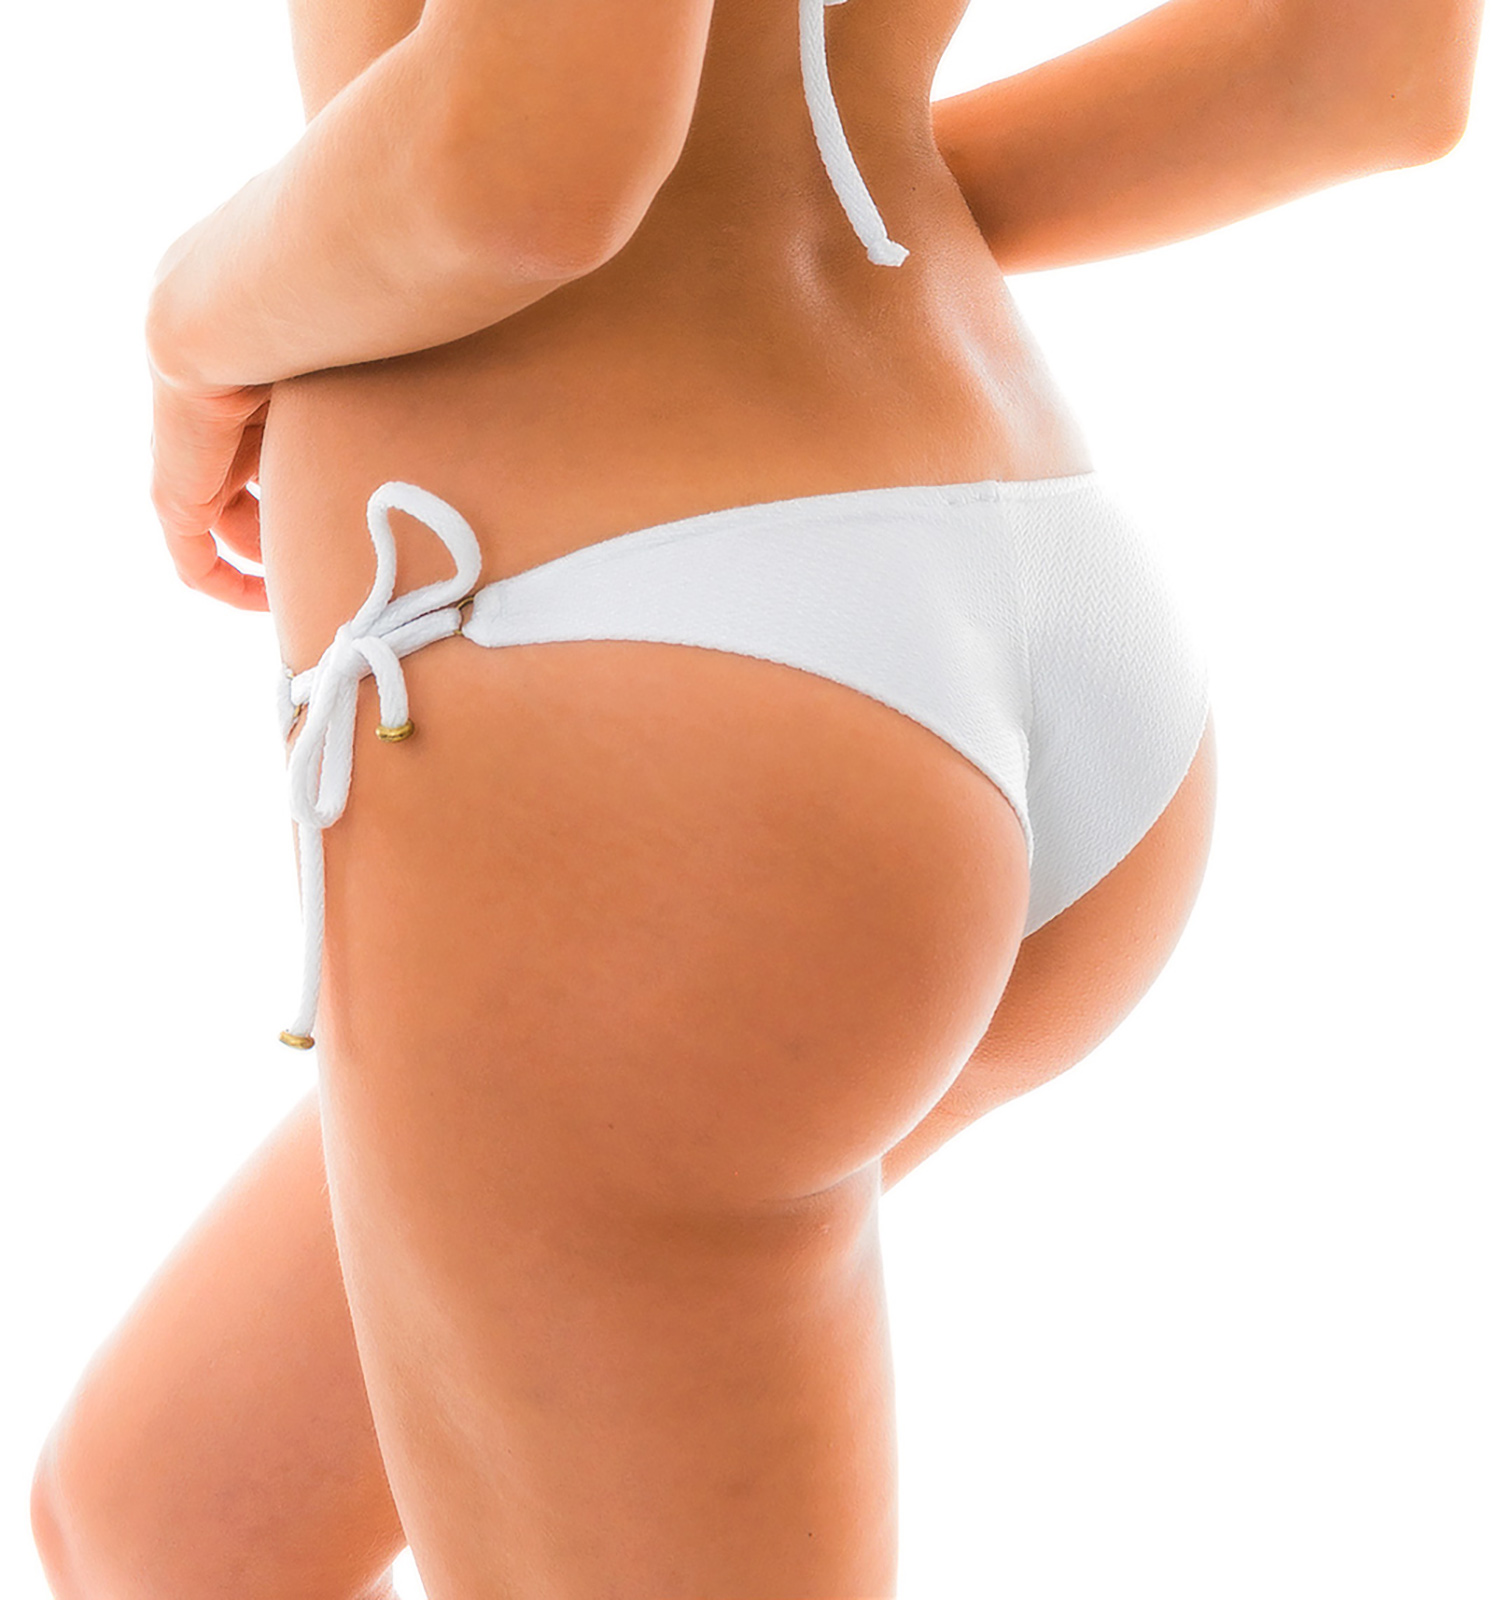 b3f09dc6a7 ... Textured and accessorized white bikini bottom - BOTTOM DUNA TRI BRANCO